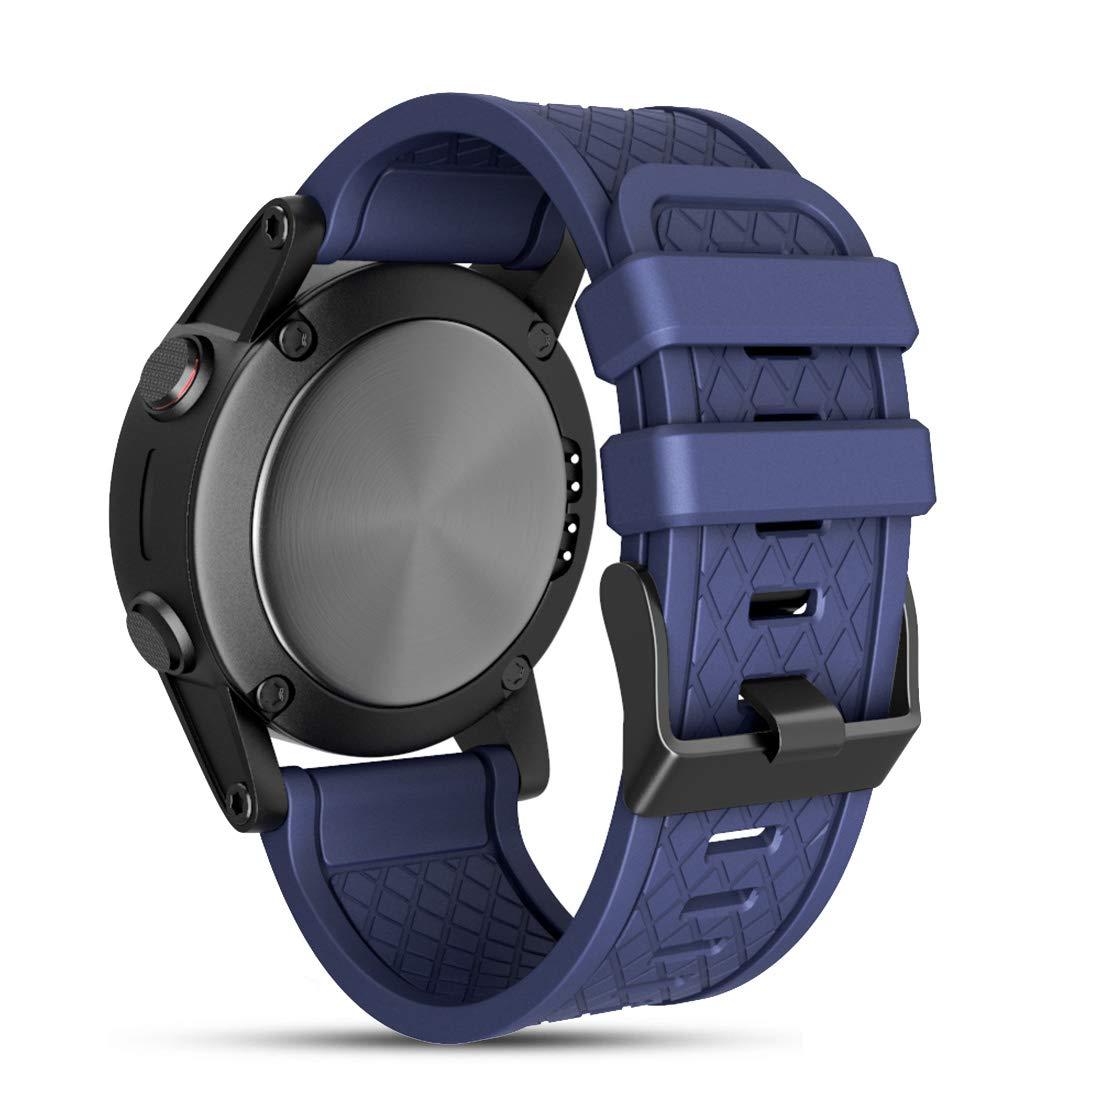 Cyeeson Soft Silicone Wristband for Garmin Fenix 1/ Fenix 2/ Fenix 3/ Fenix 3HR/ Fenix 5X, Strap Smartwatch Bracelet Band